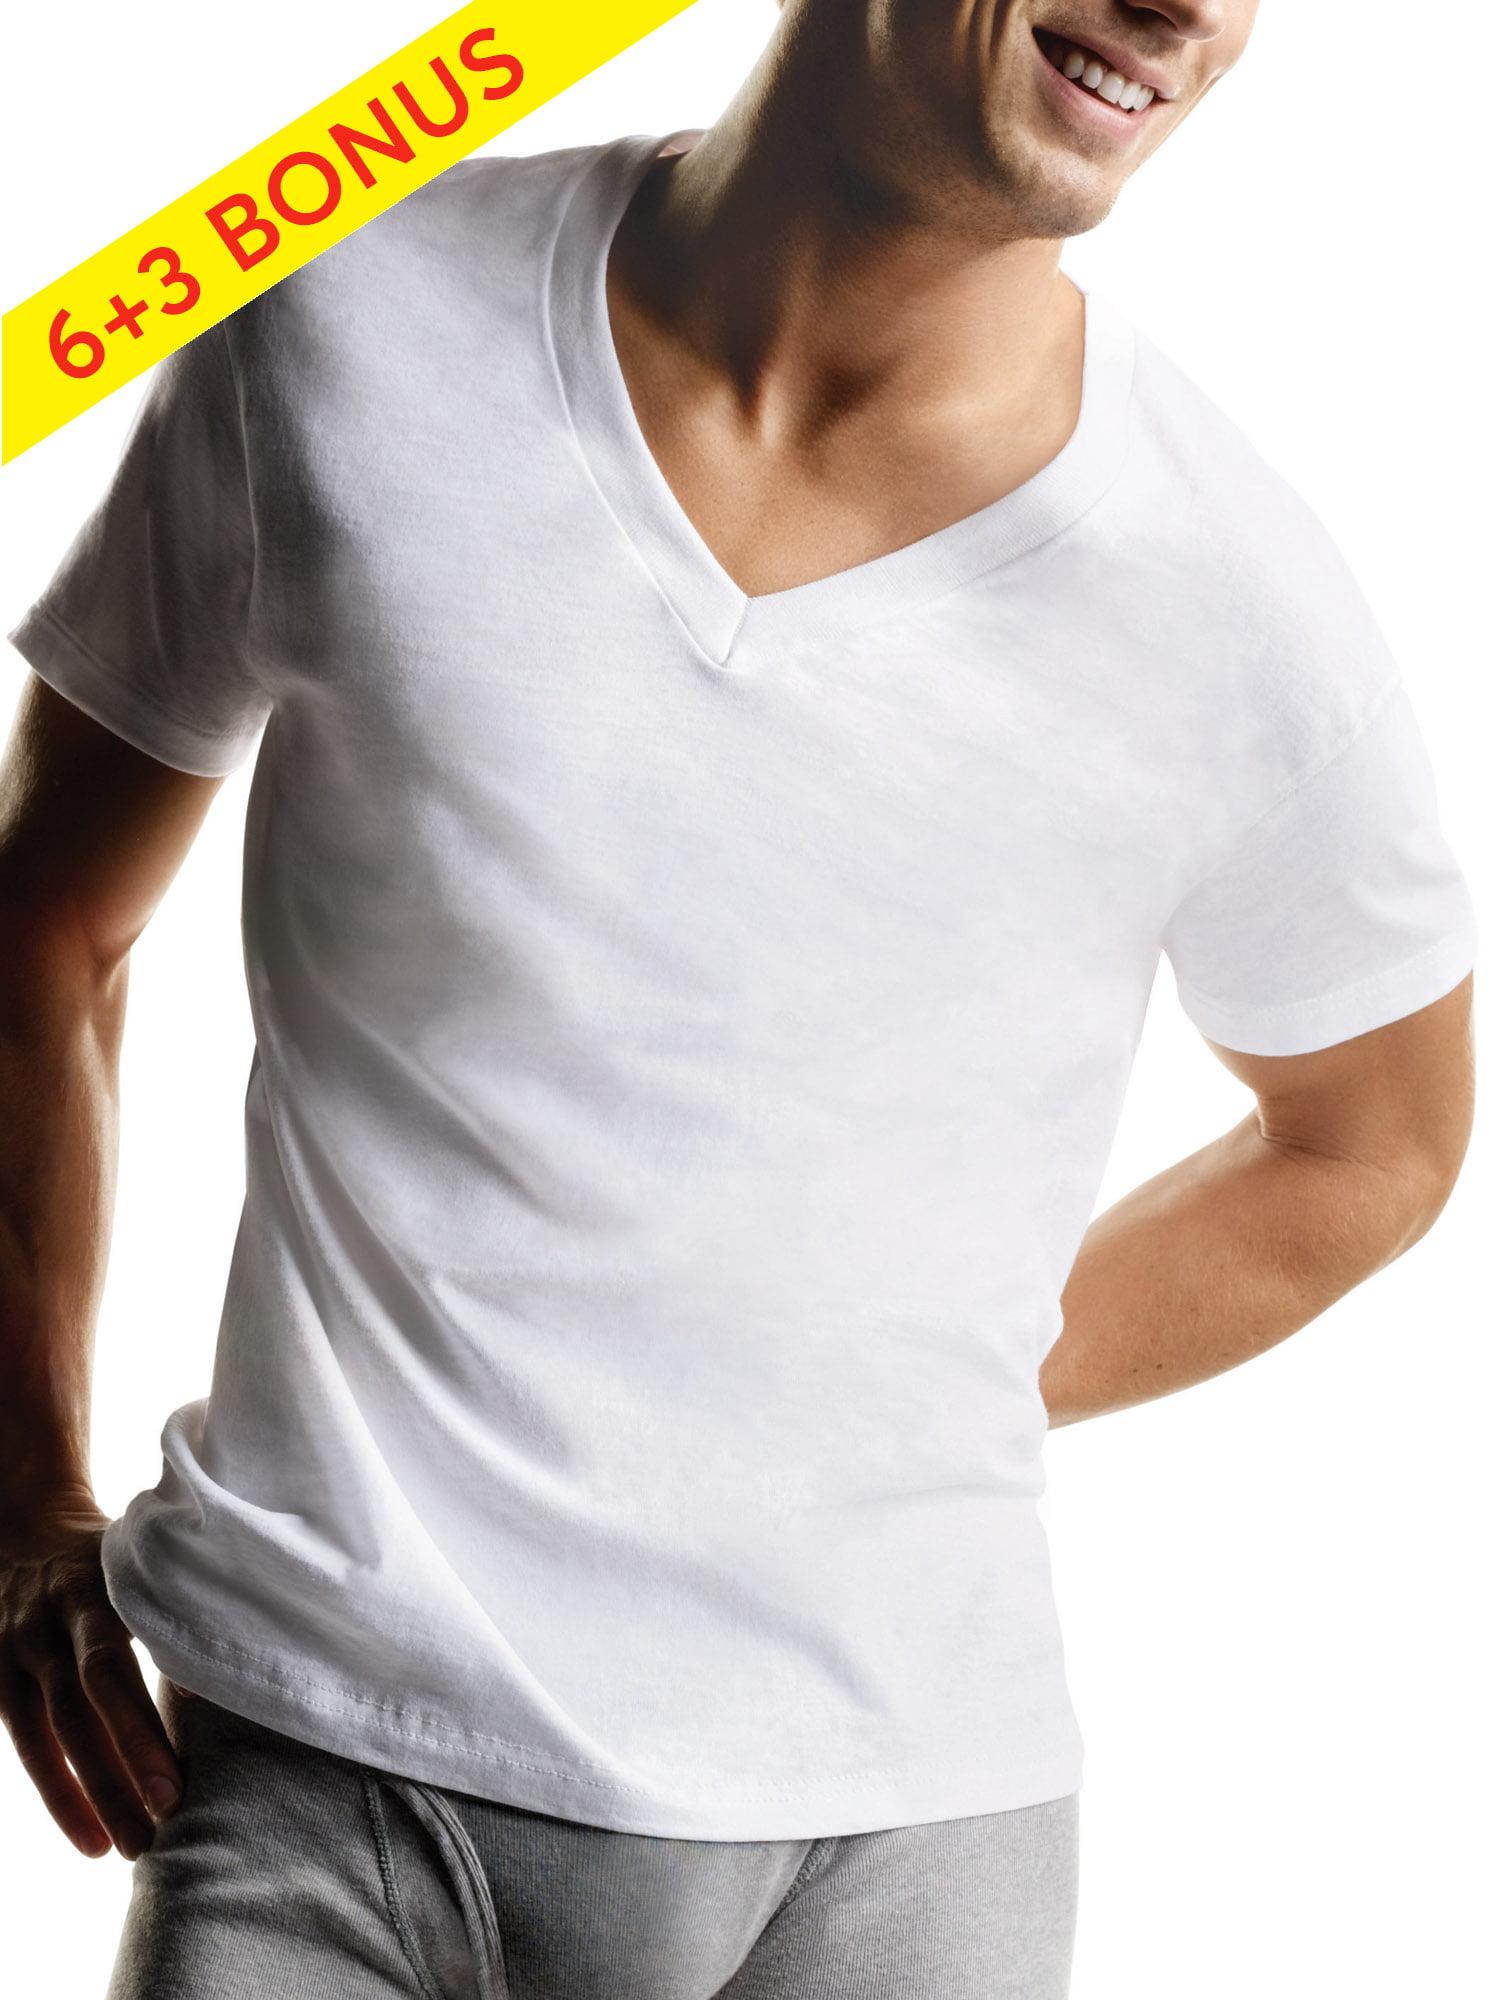 Hanes - Hanes Men's Tagless ComfortSoft White V-Neck Undershirt, 6 + 3 Bonus Pack - Walmart.com